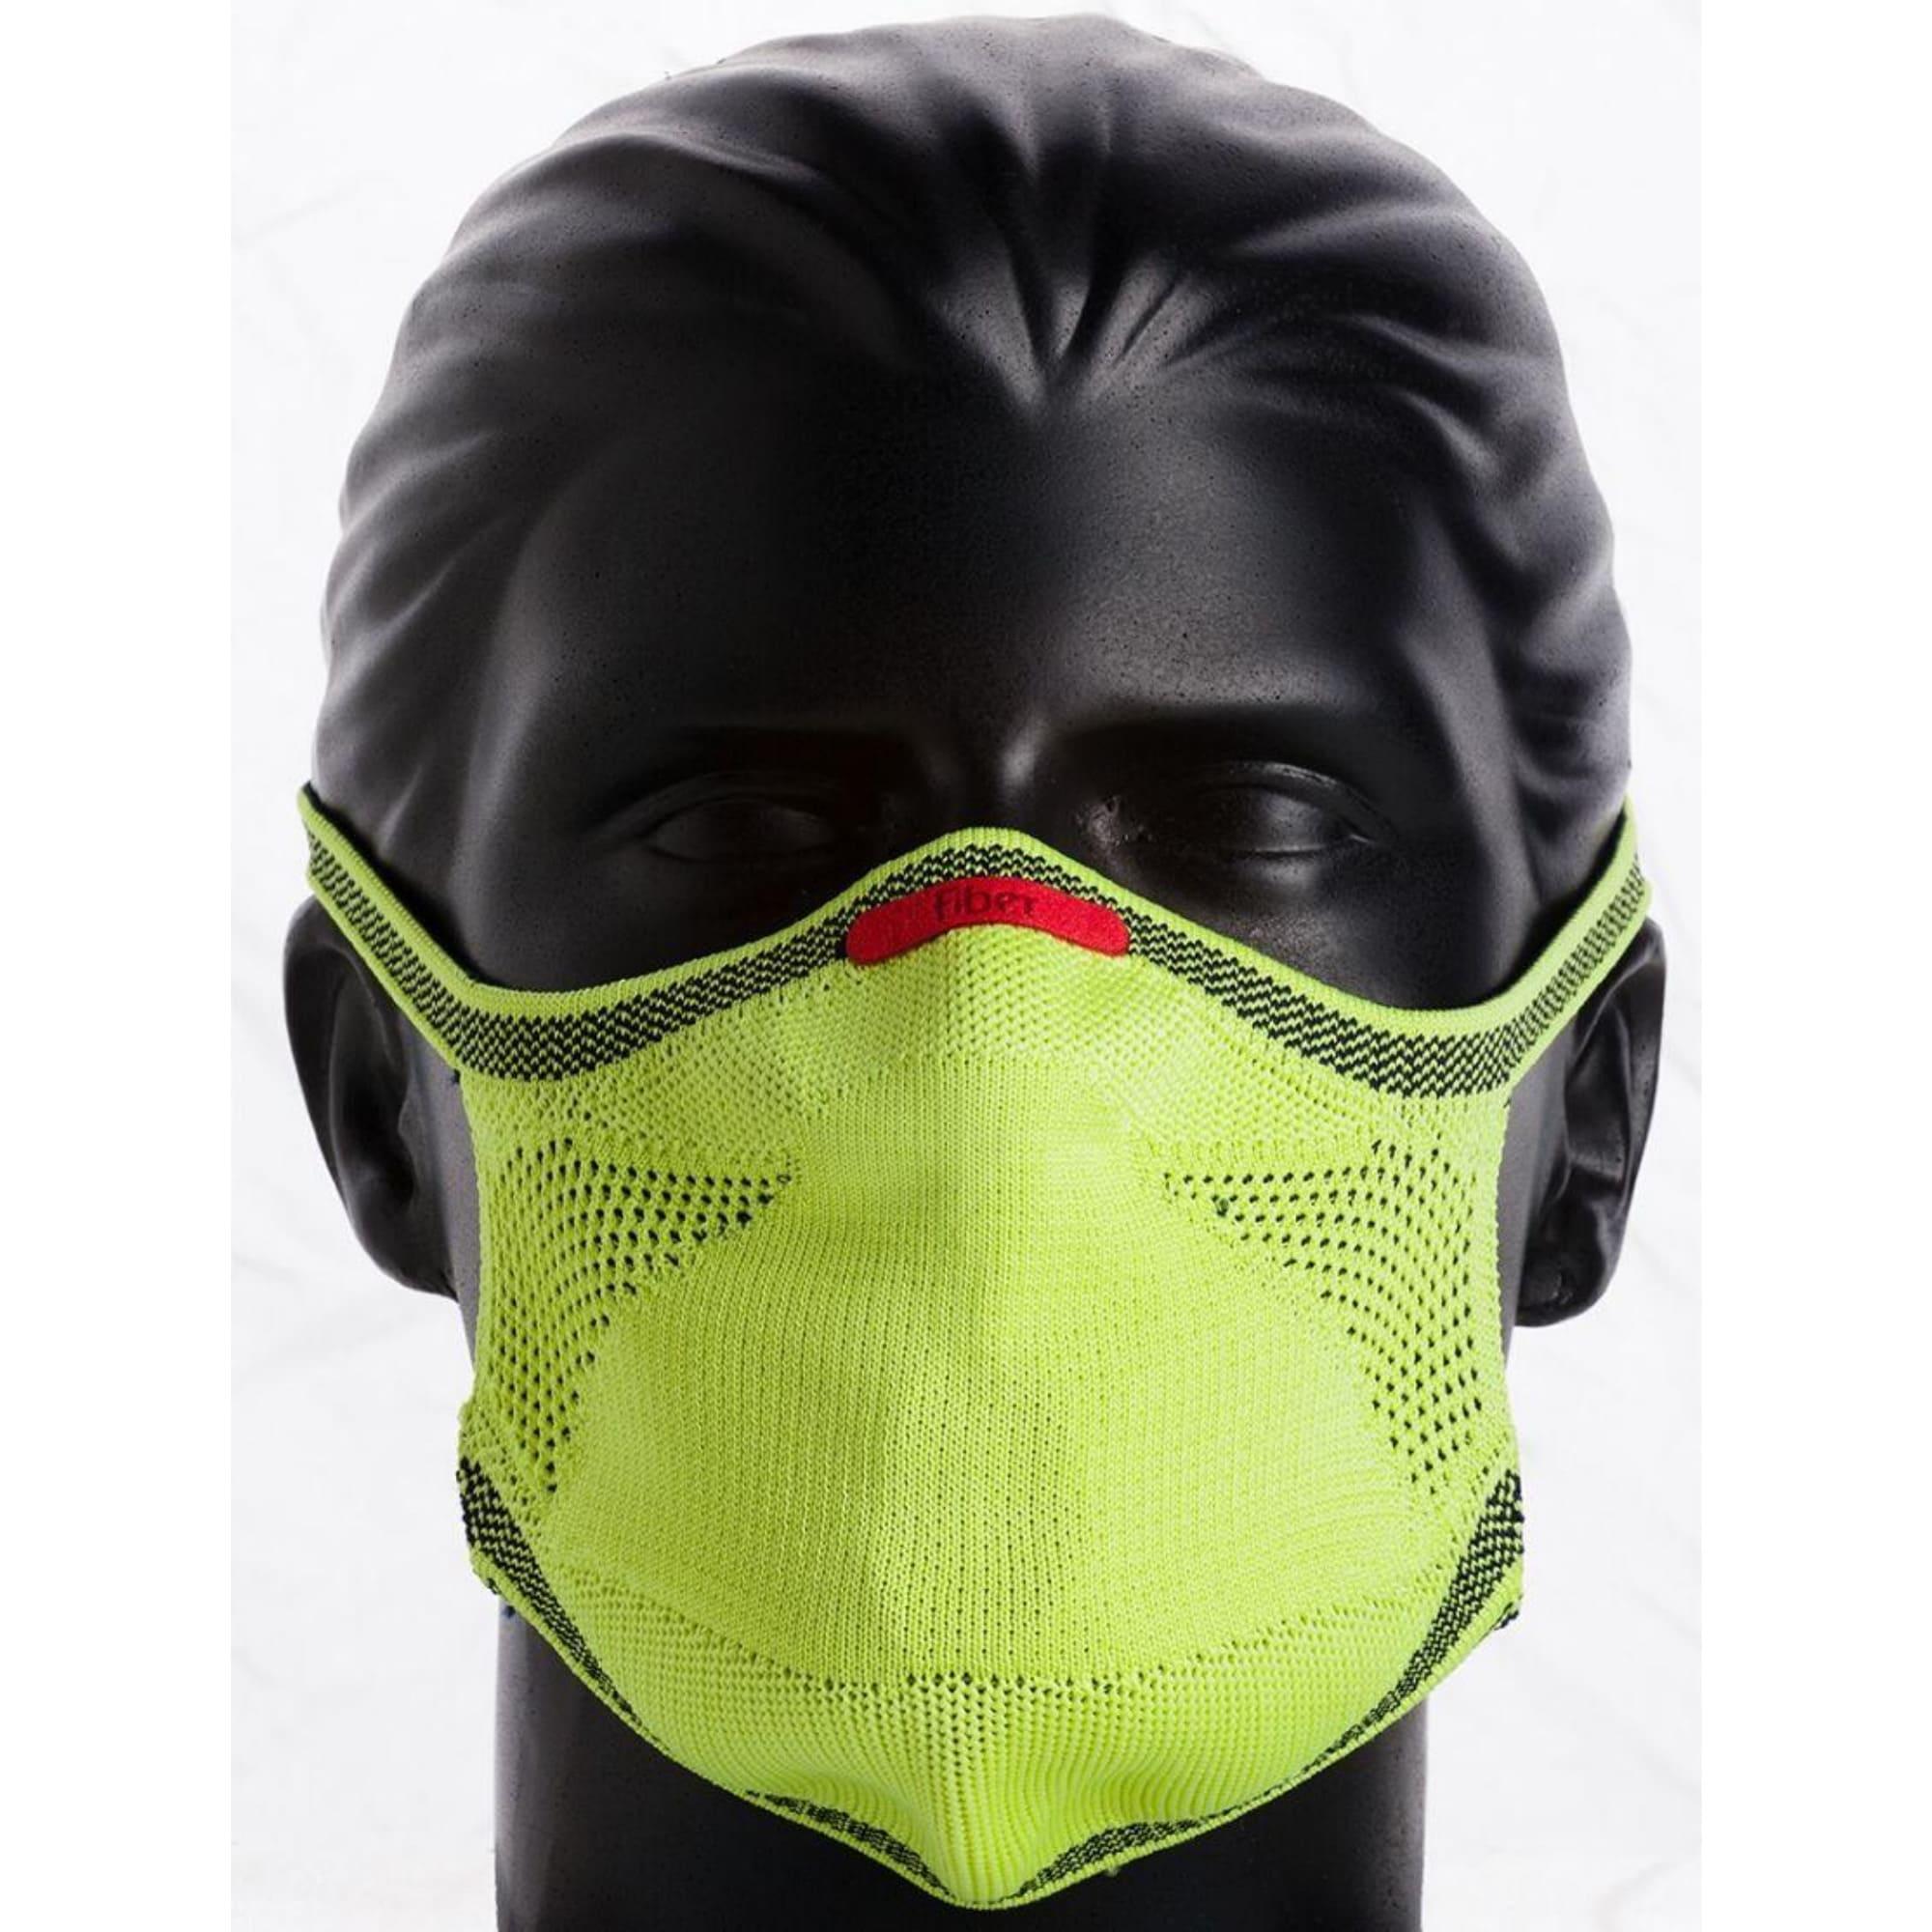 Máscara Esportiva KNIT - VERDE LIMÃO